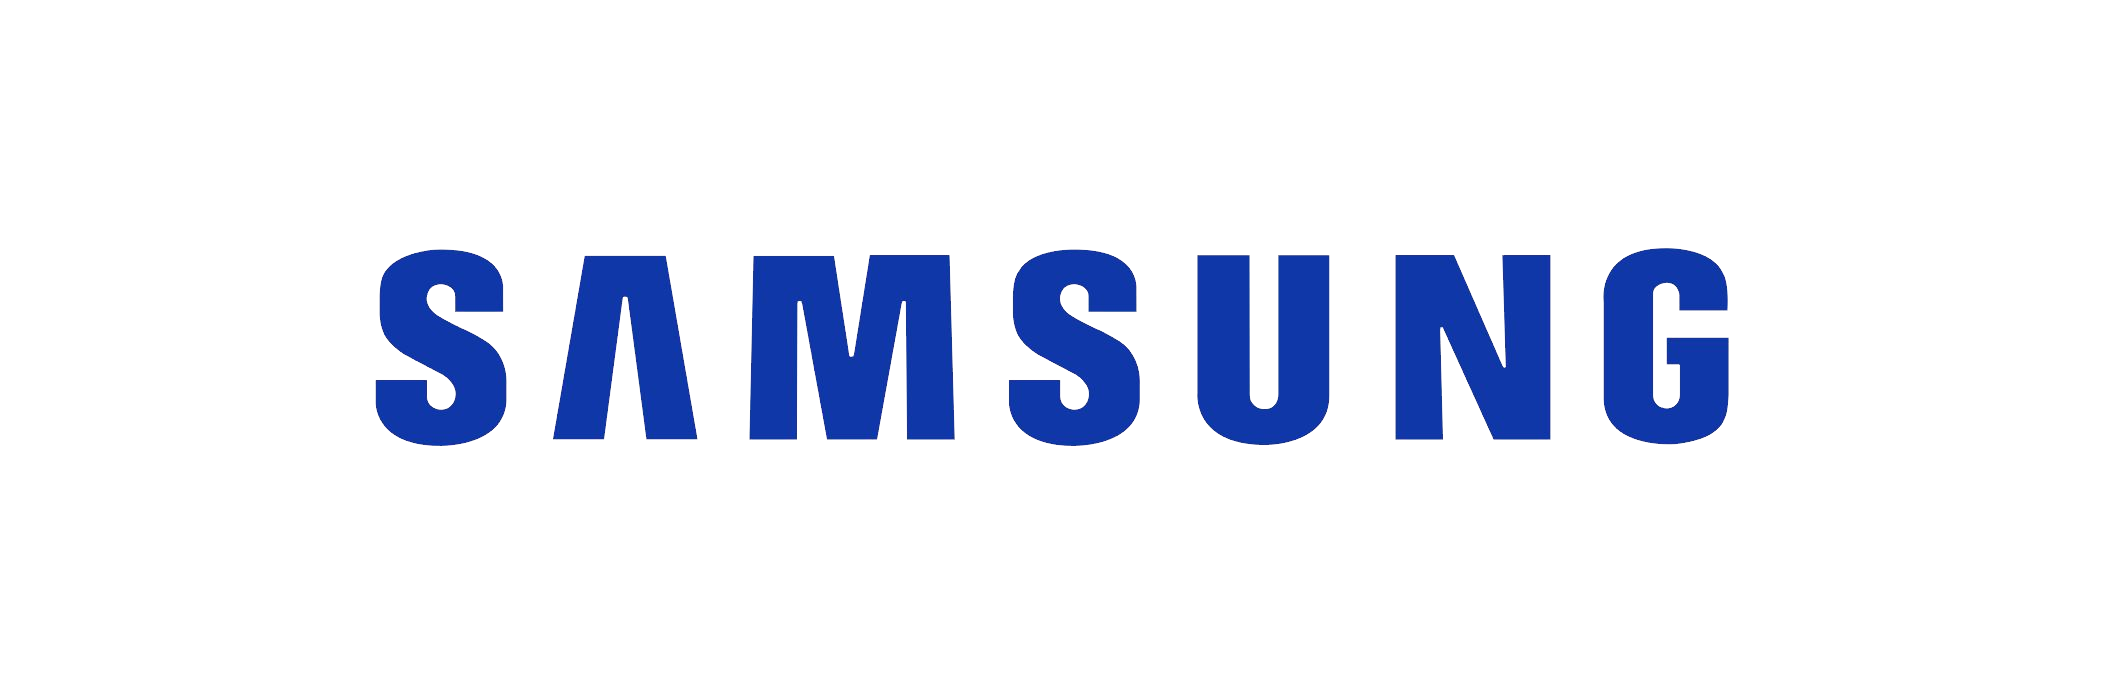 samsung-logo-png-samsung-logo-png-2104.png